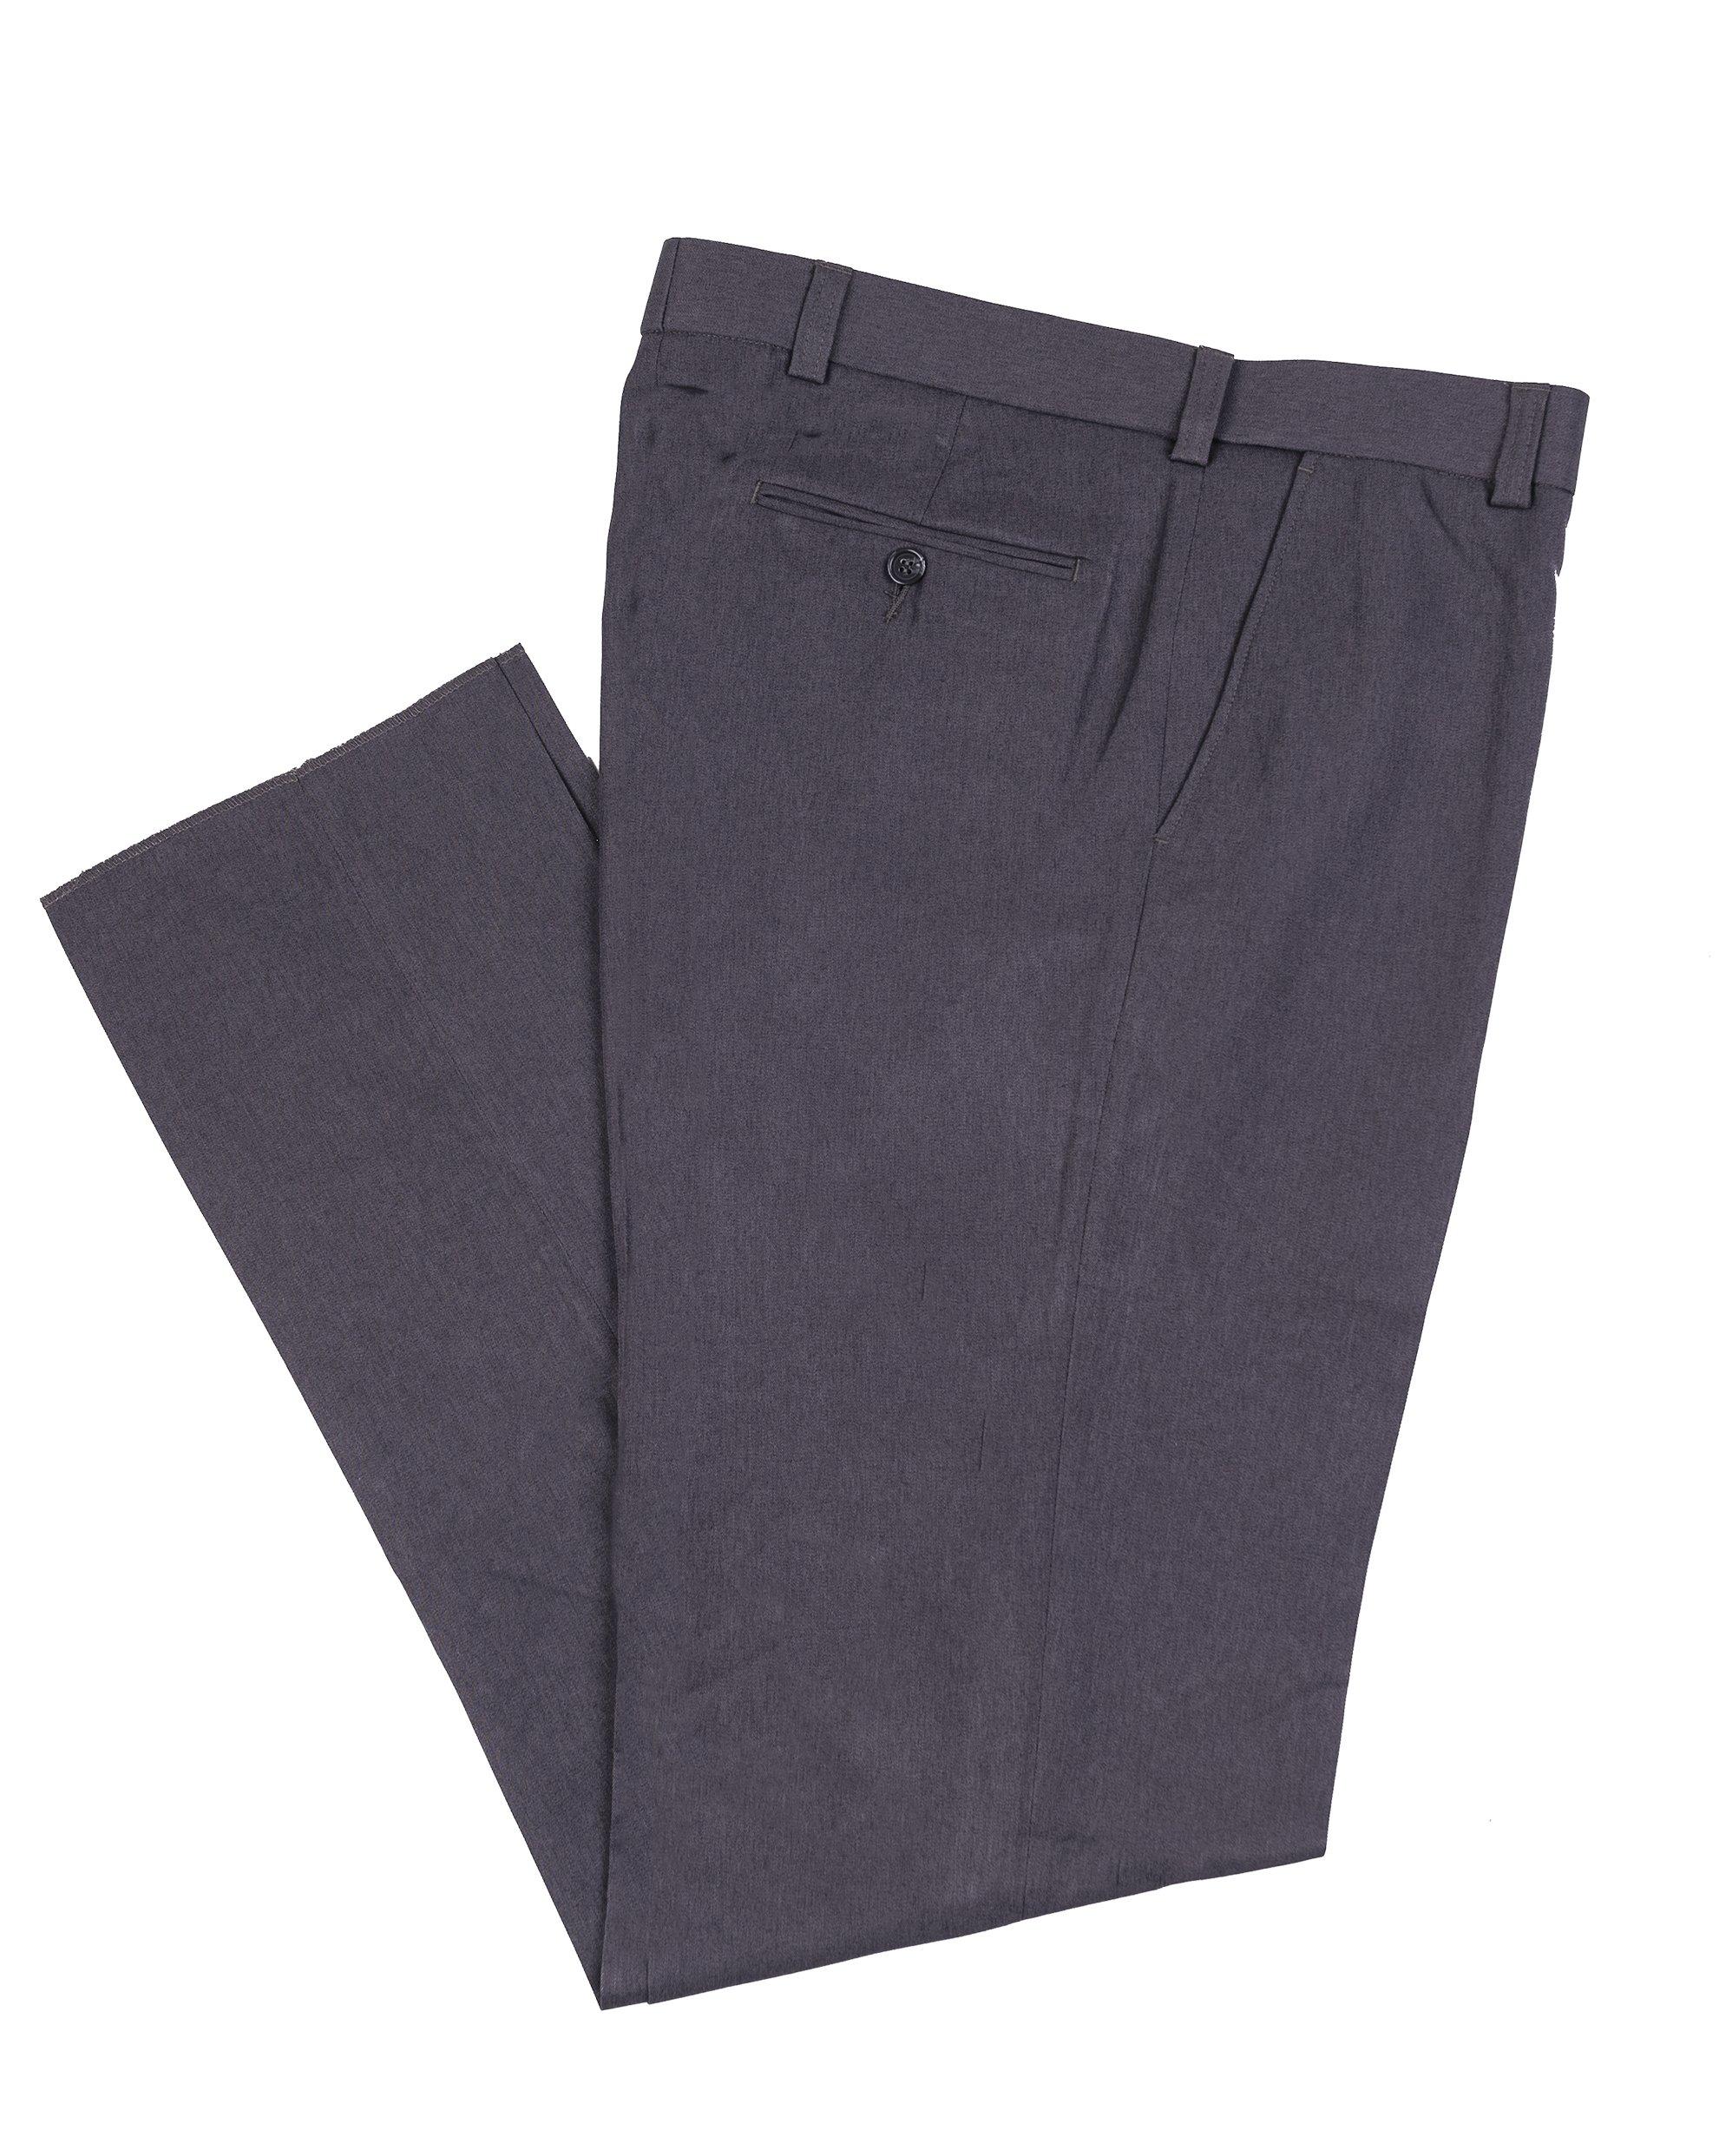 J Braxx Mens Expandable Waist Wrinkle Resistant Washable Dress Pant, Flat Front Grey 46